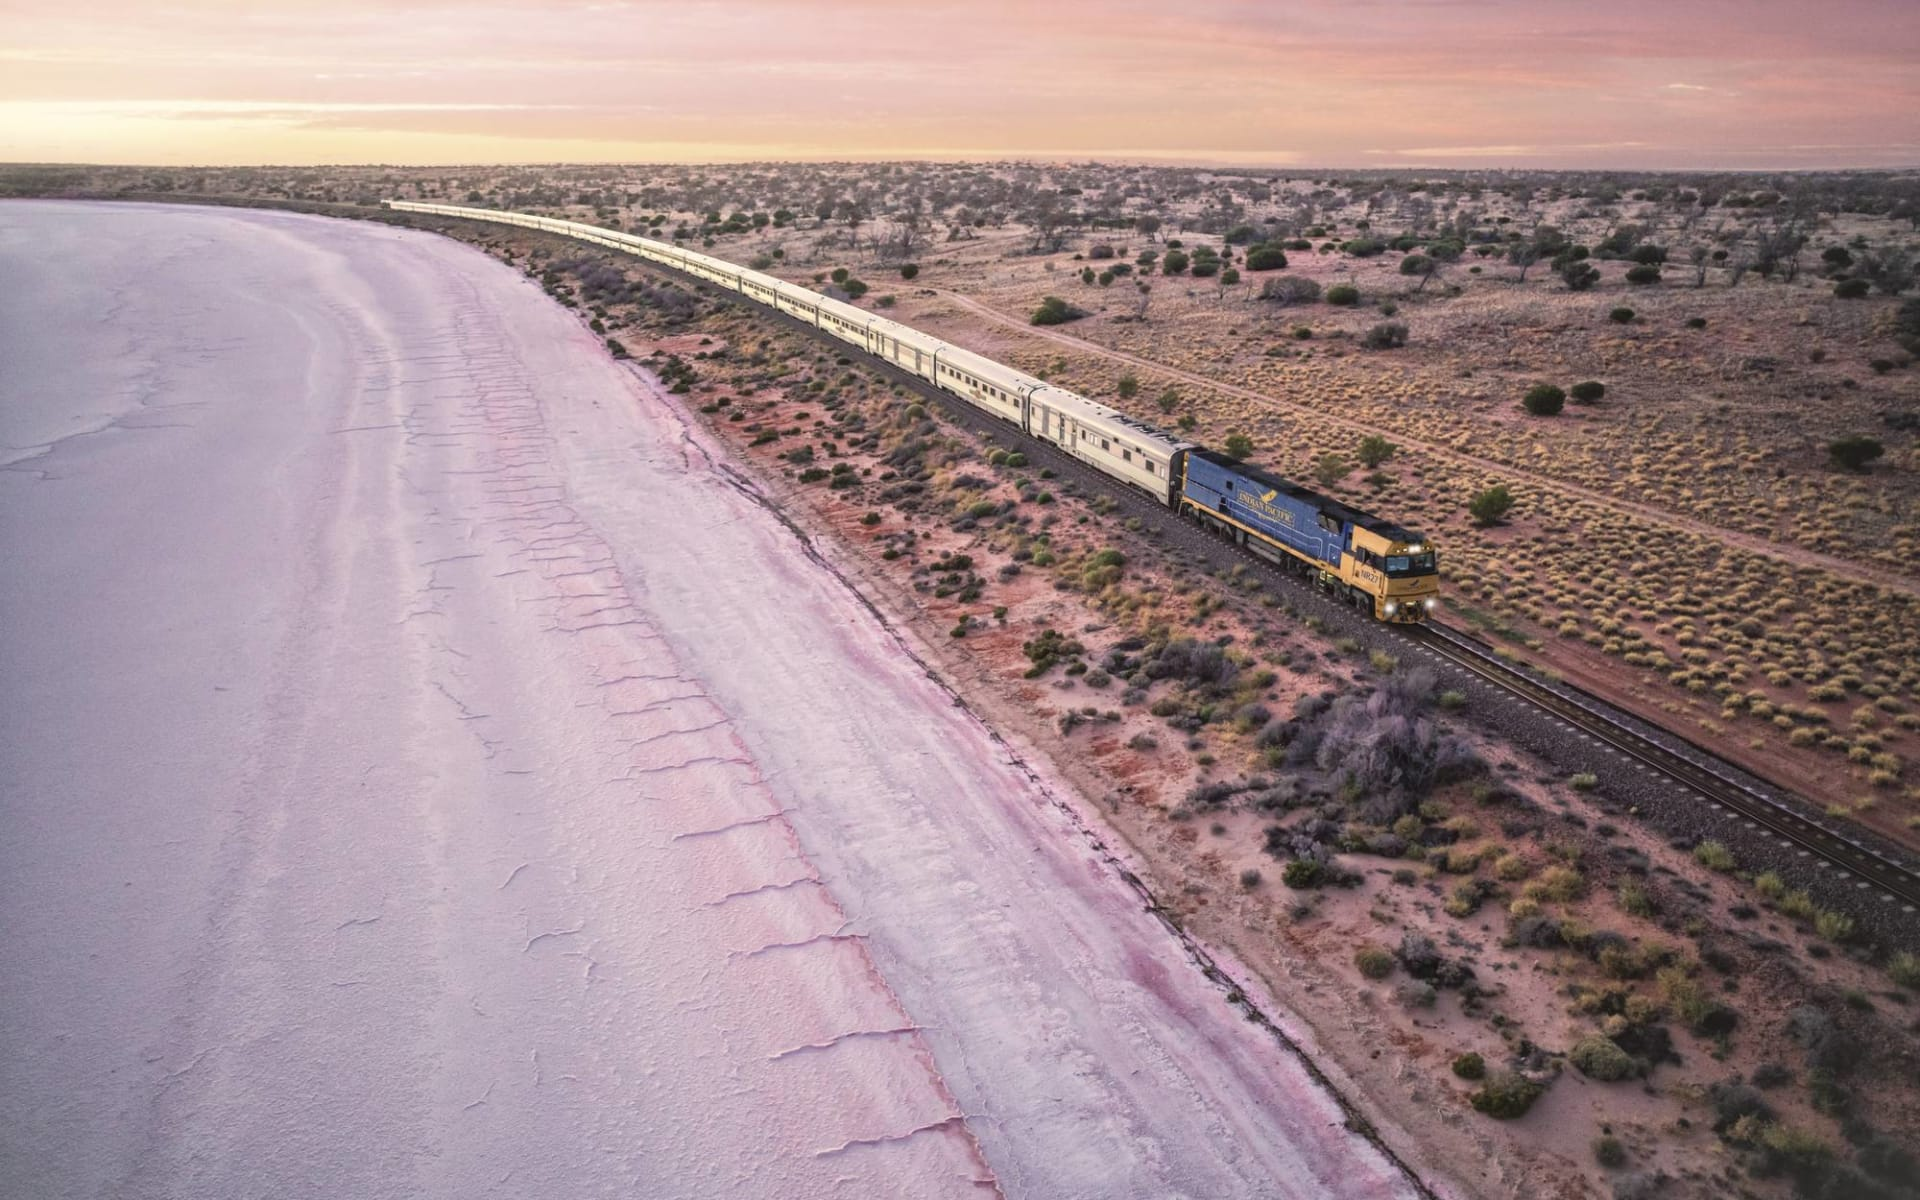 Indian Pacific von Adelaide nach Perth: Australien - Bahnreisen - Indian Pacific Salzsee Lake Hart bei Woomera  2018